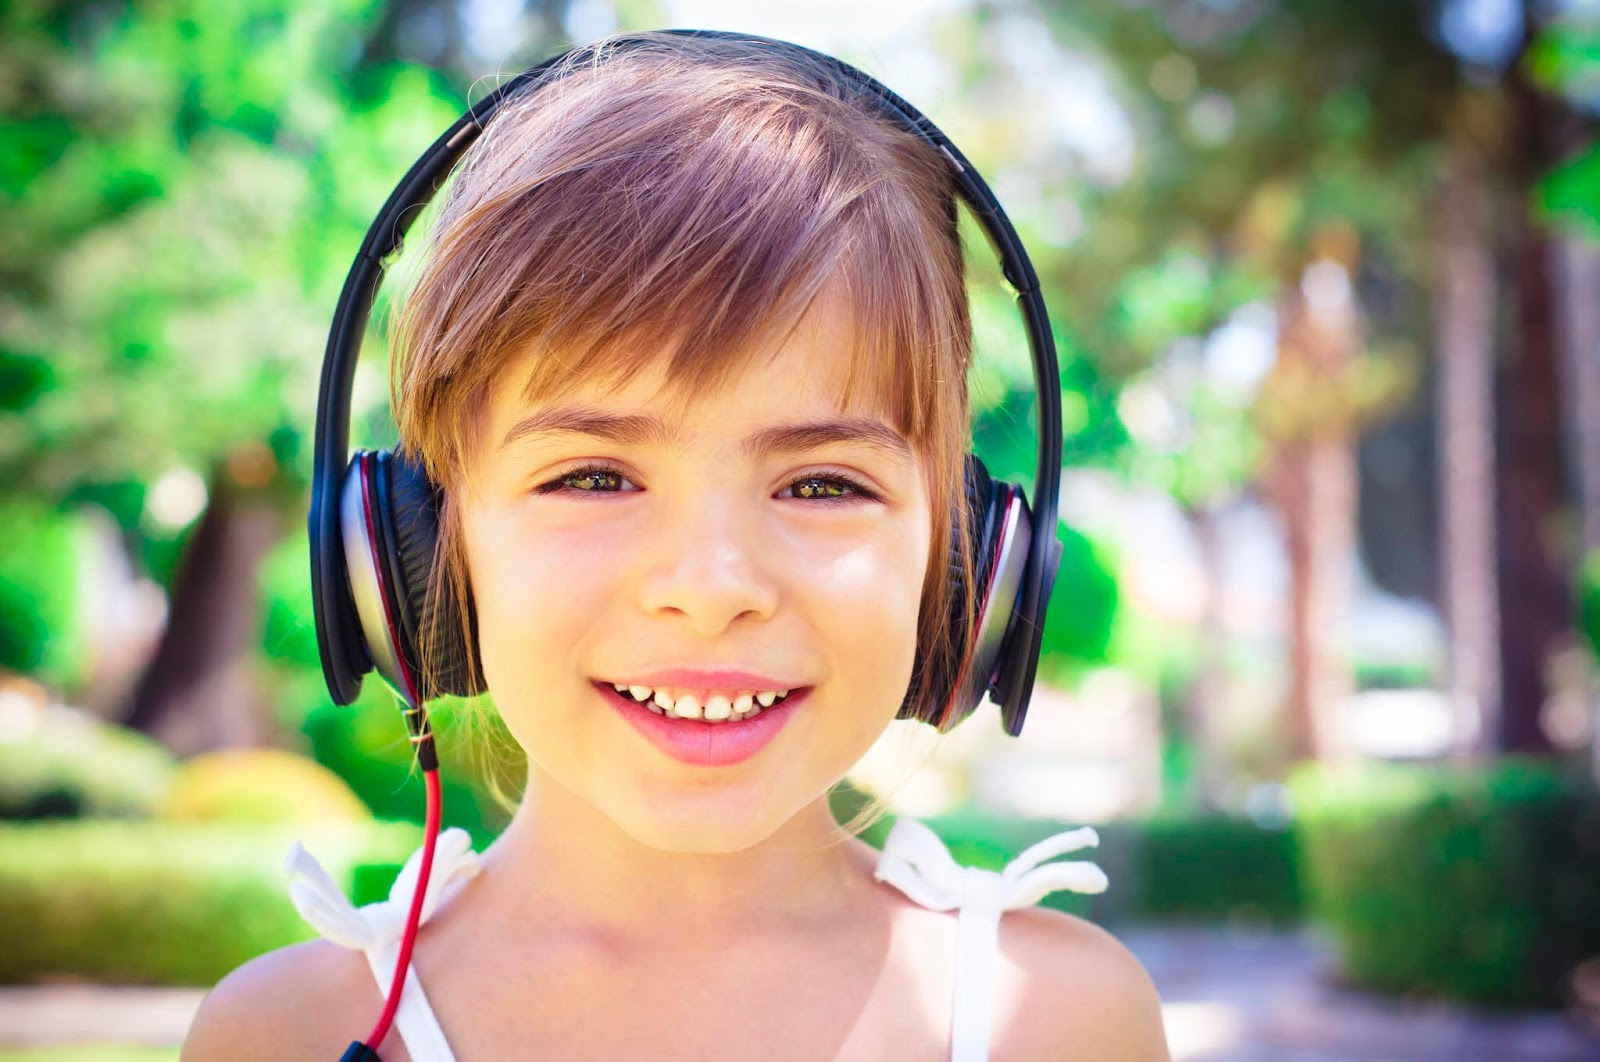 montessori activities at home. Listening to audiobooks.